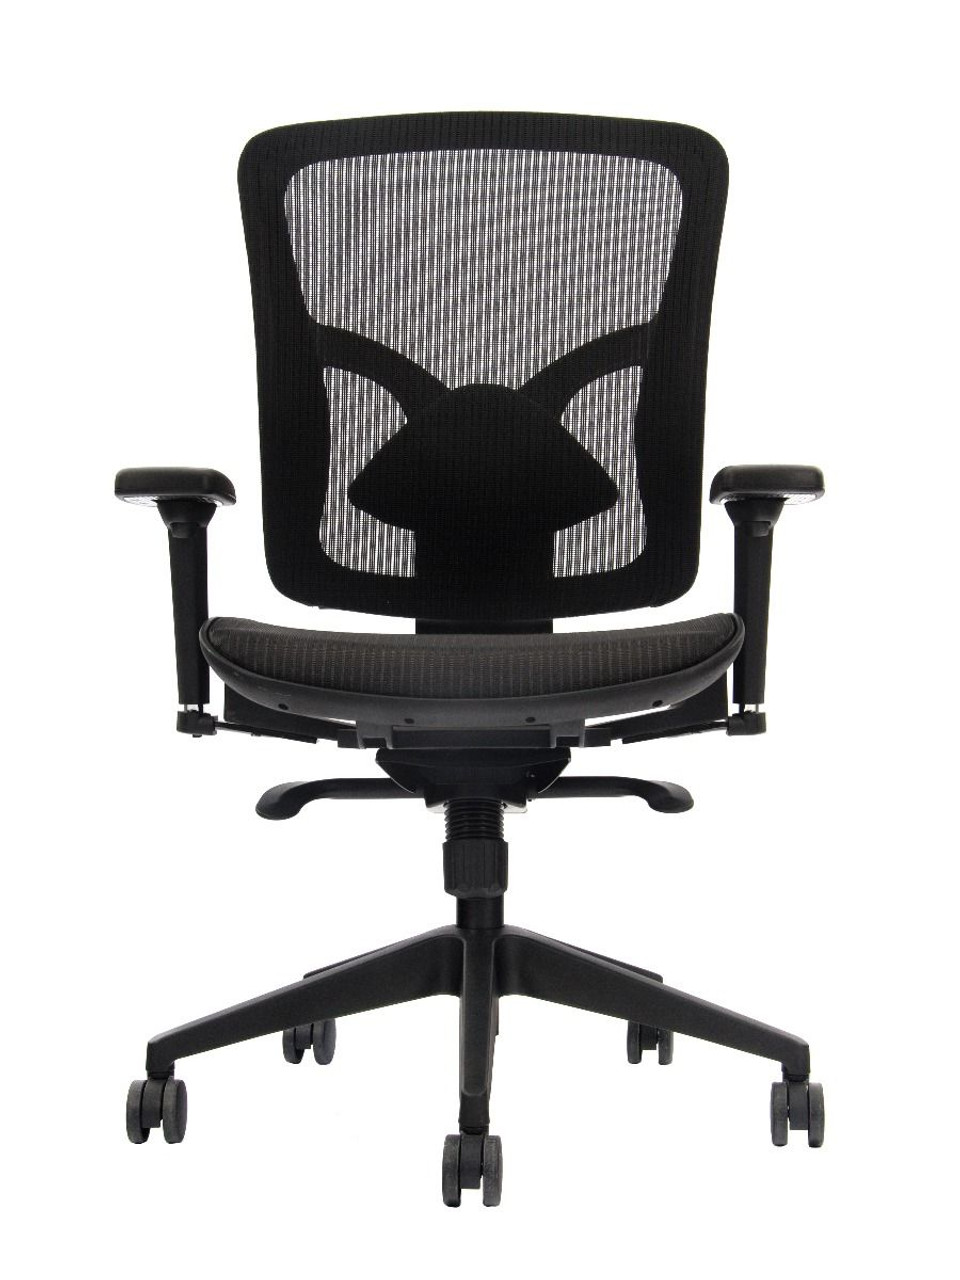 Aero Mesh task chair